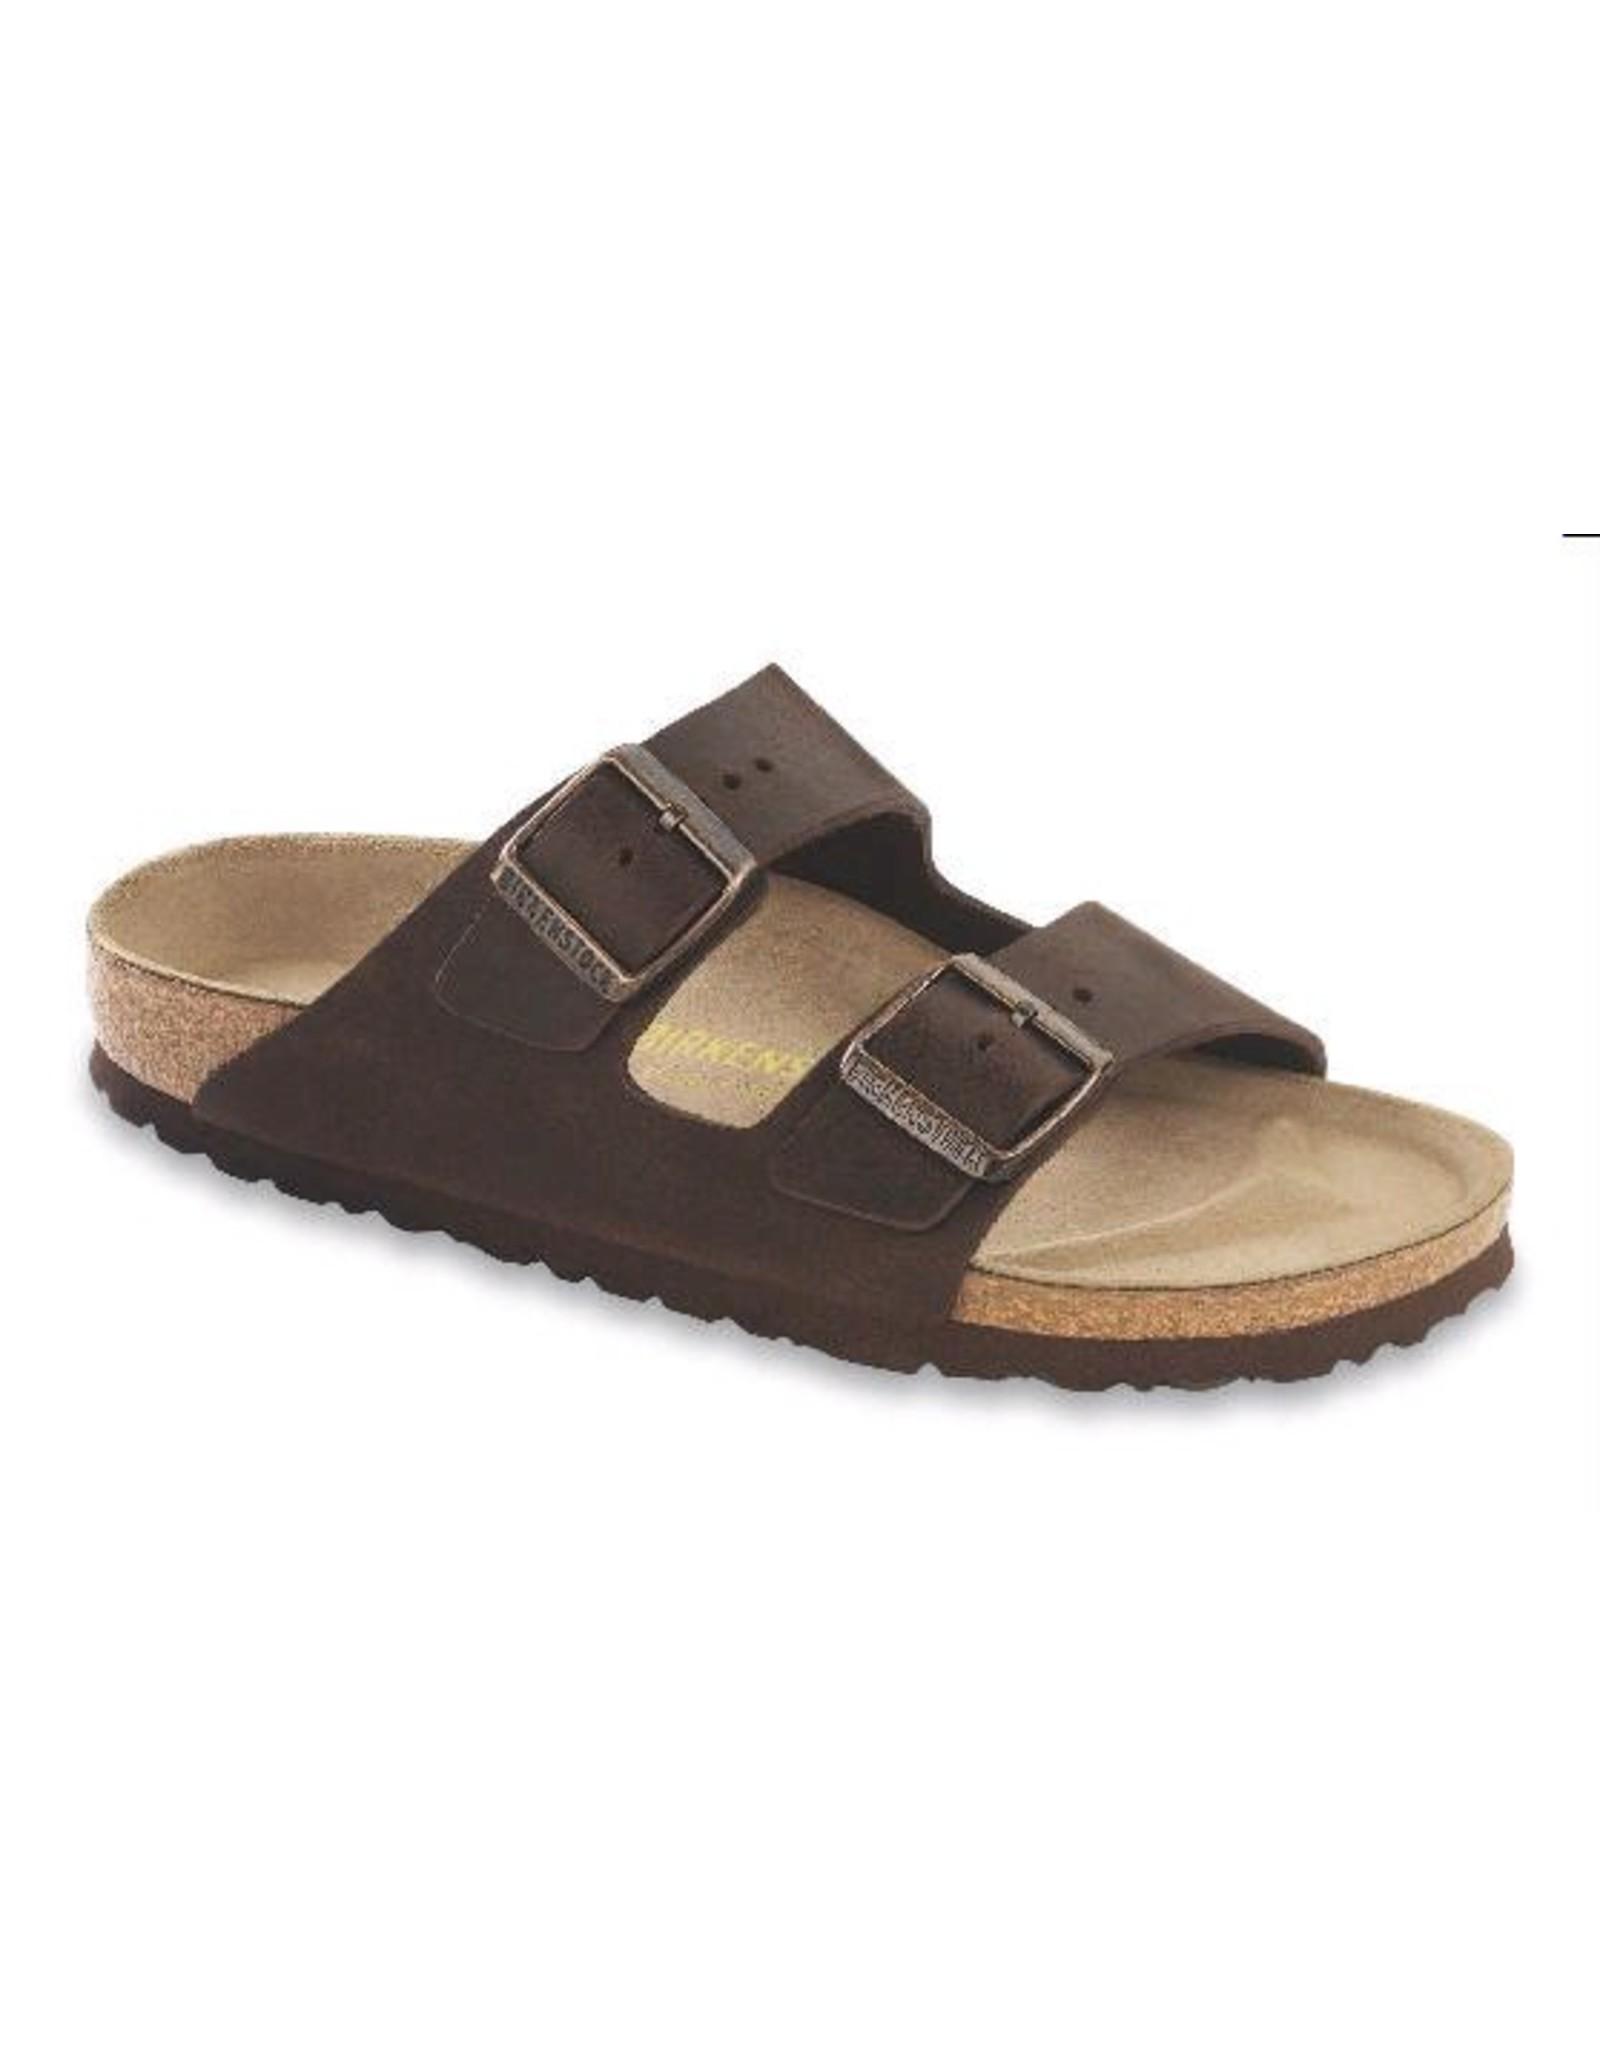 Birkenstock Soft Footbed Habana Oiled Leather Arizona Sandal